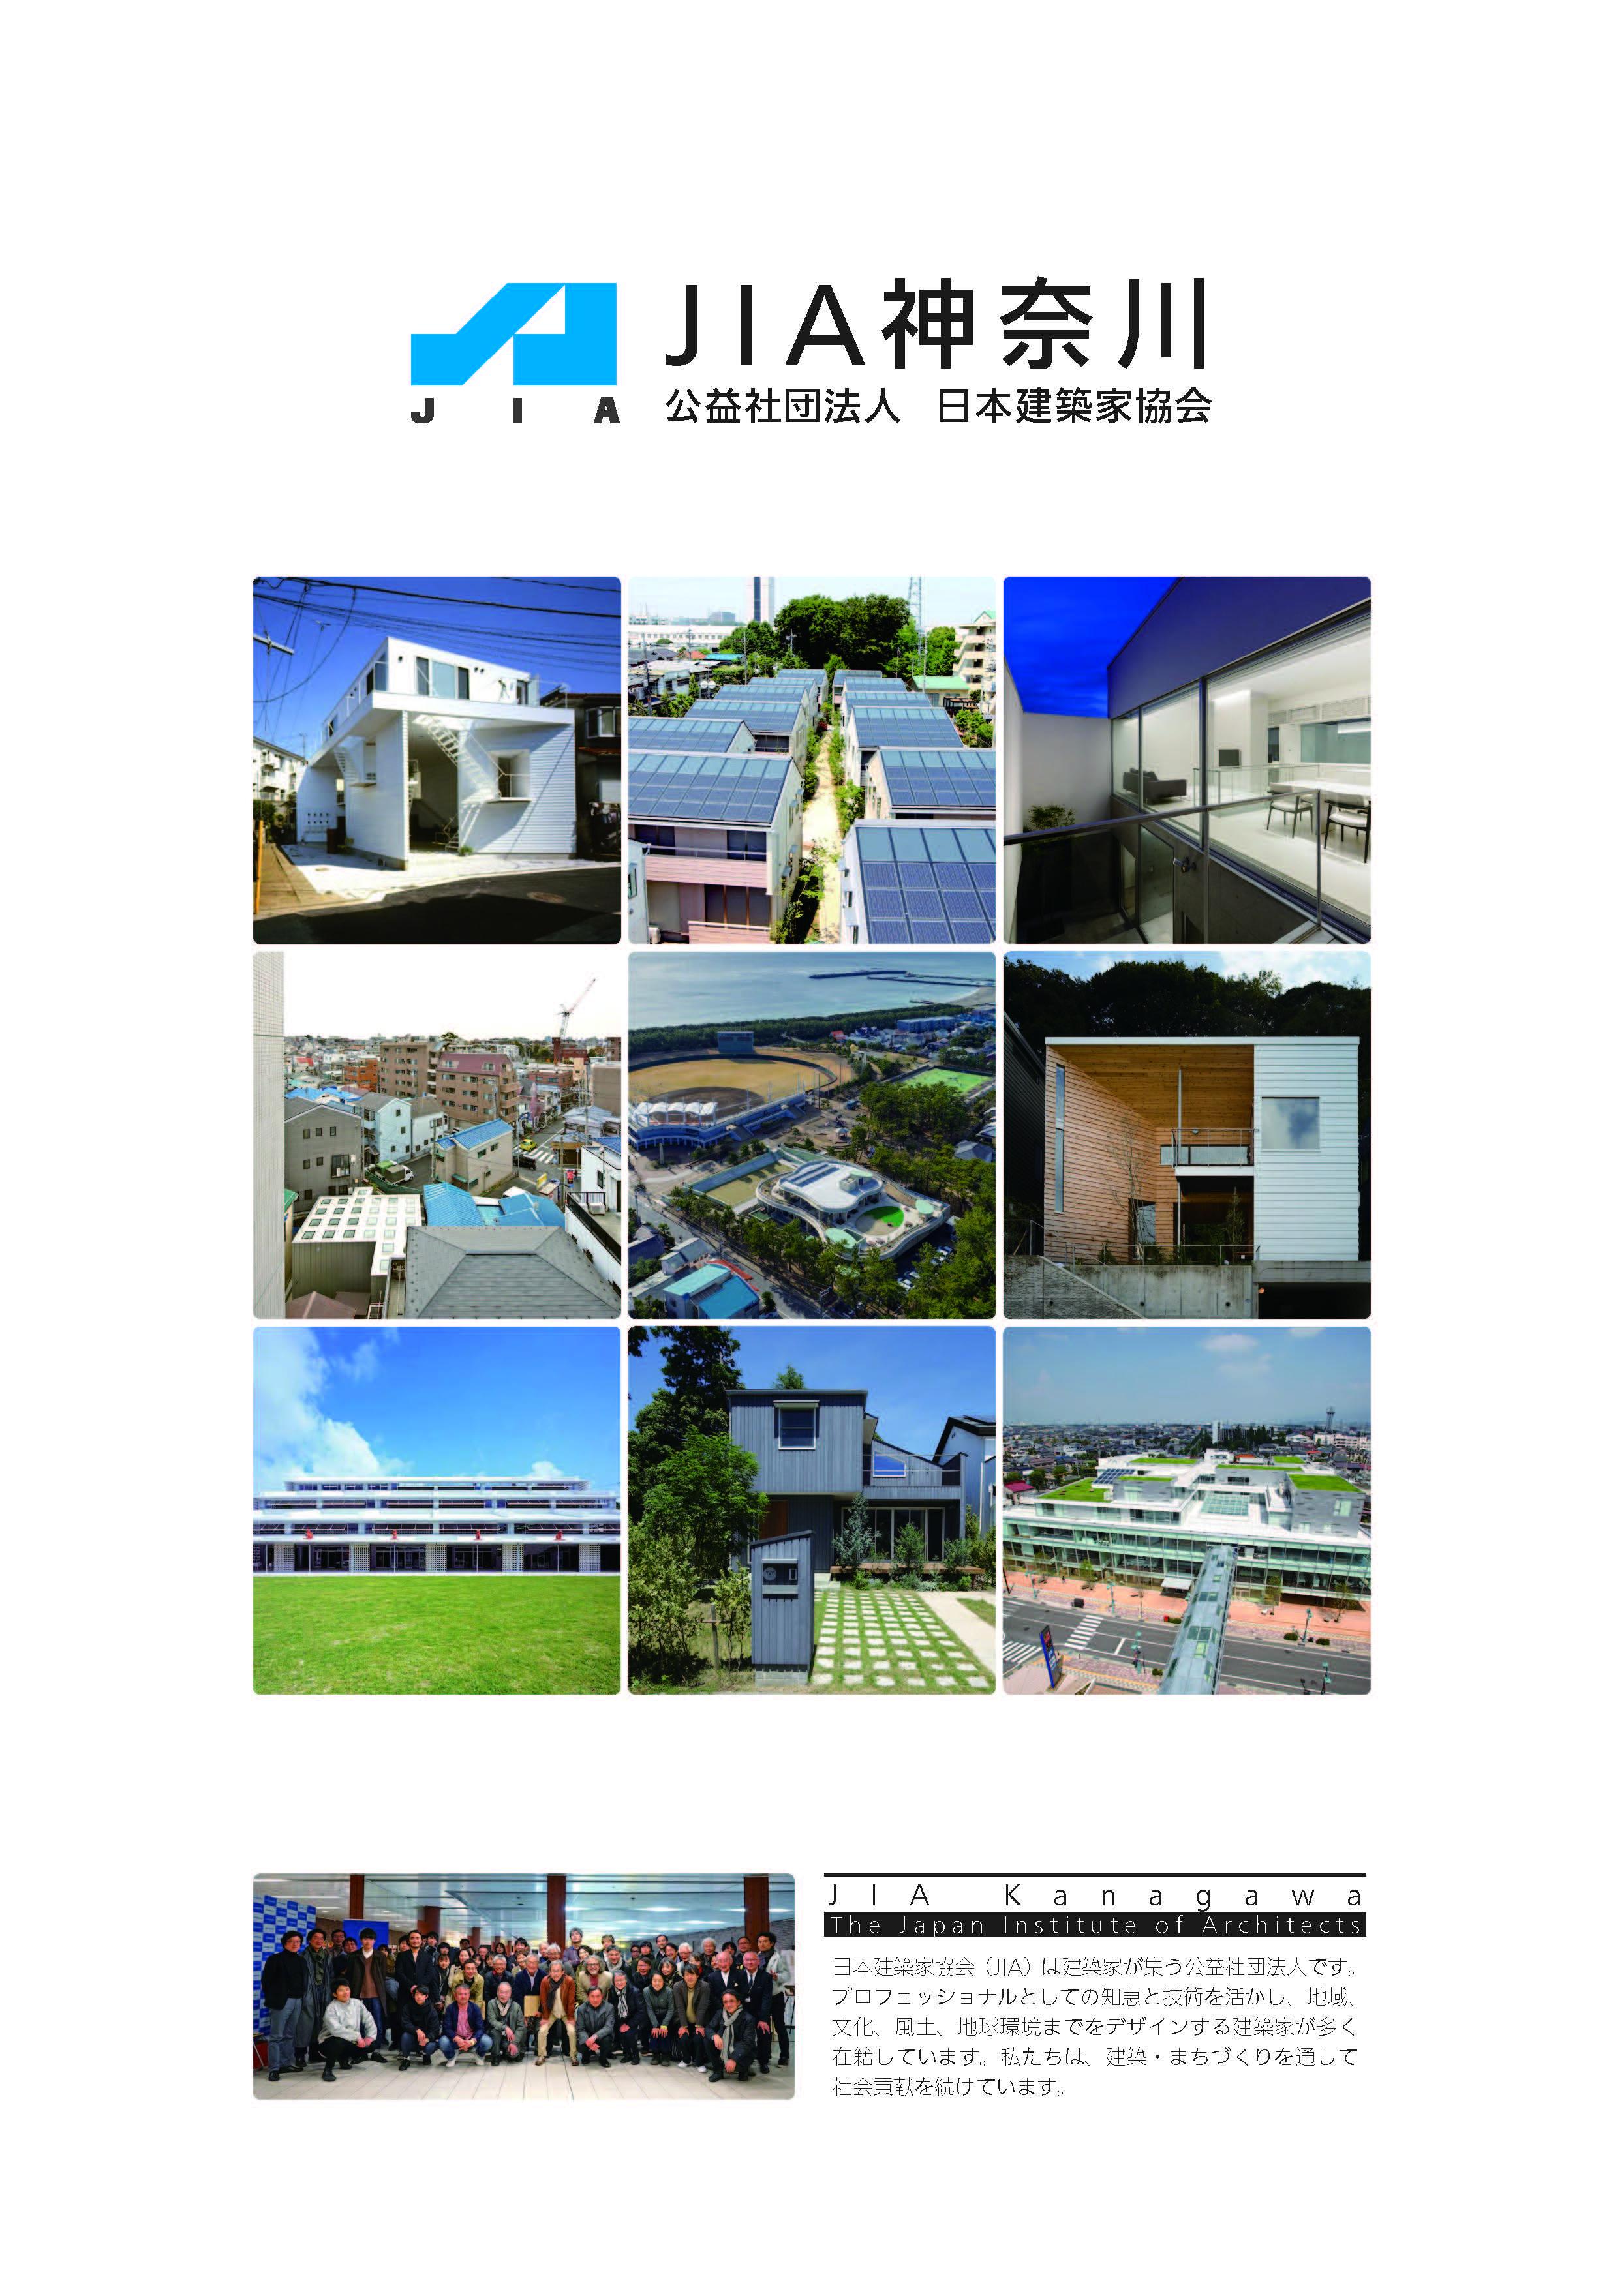 JIA神奈川パンフレット2020年度版が完成しました